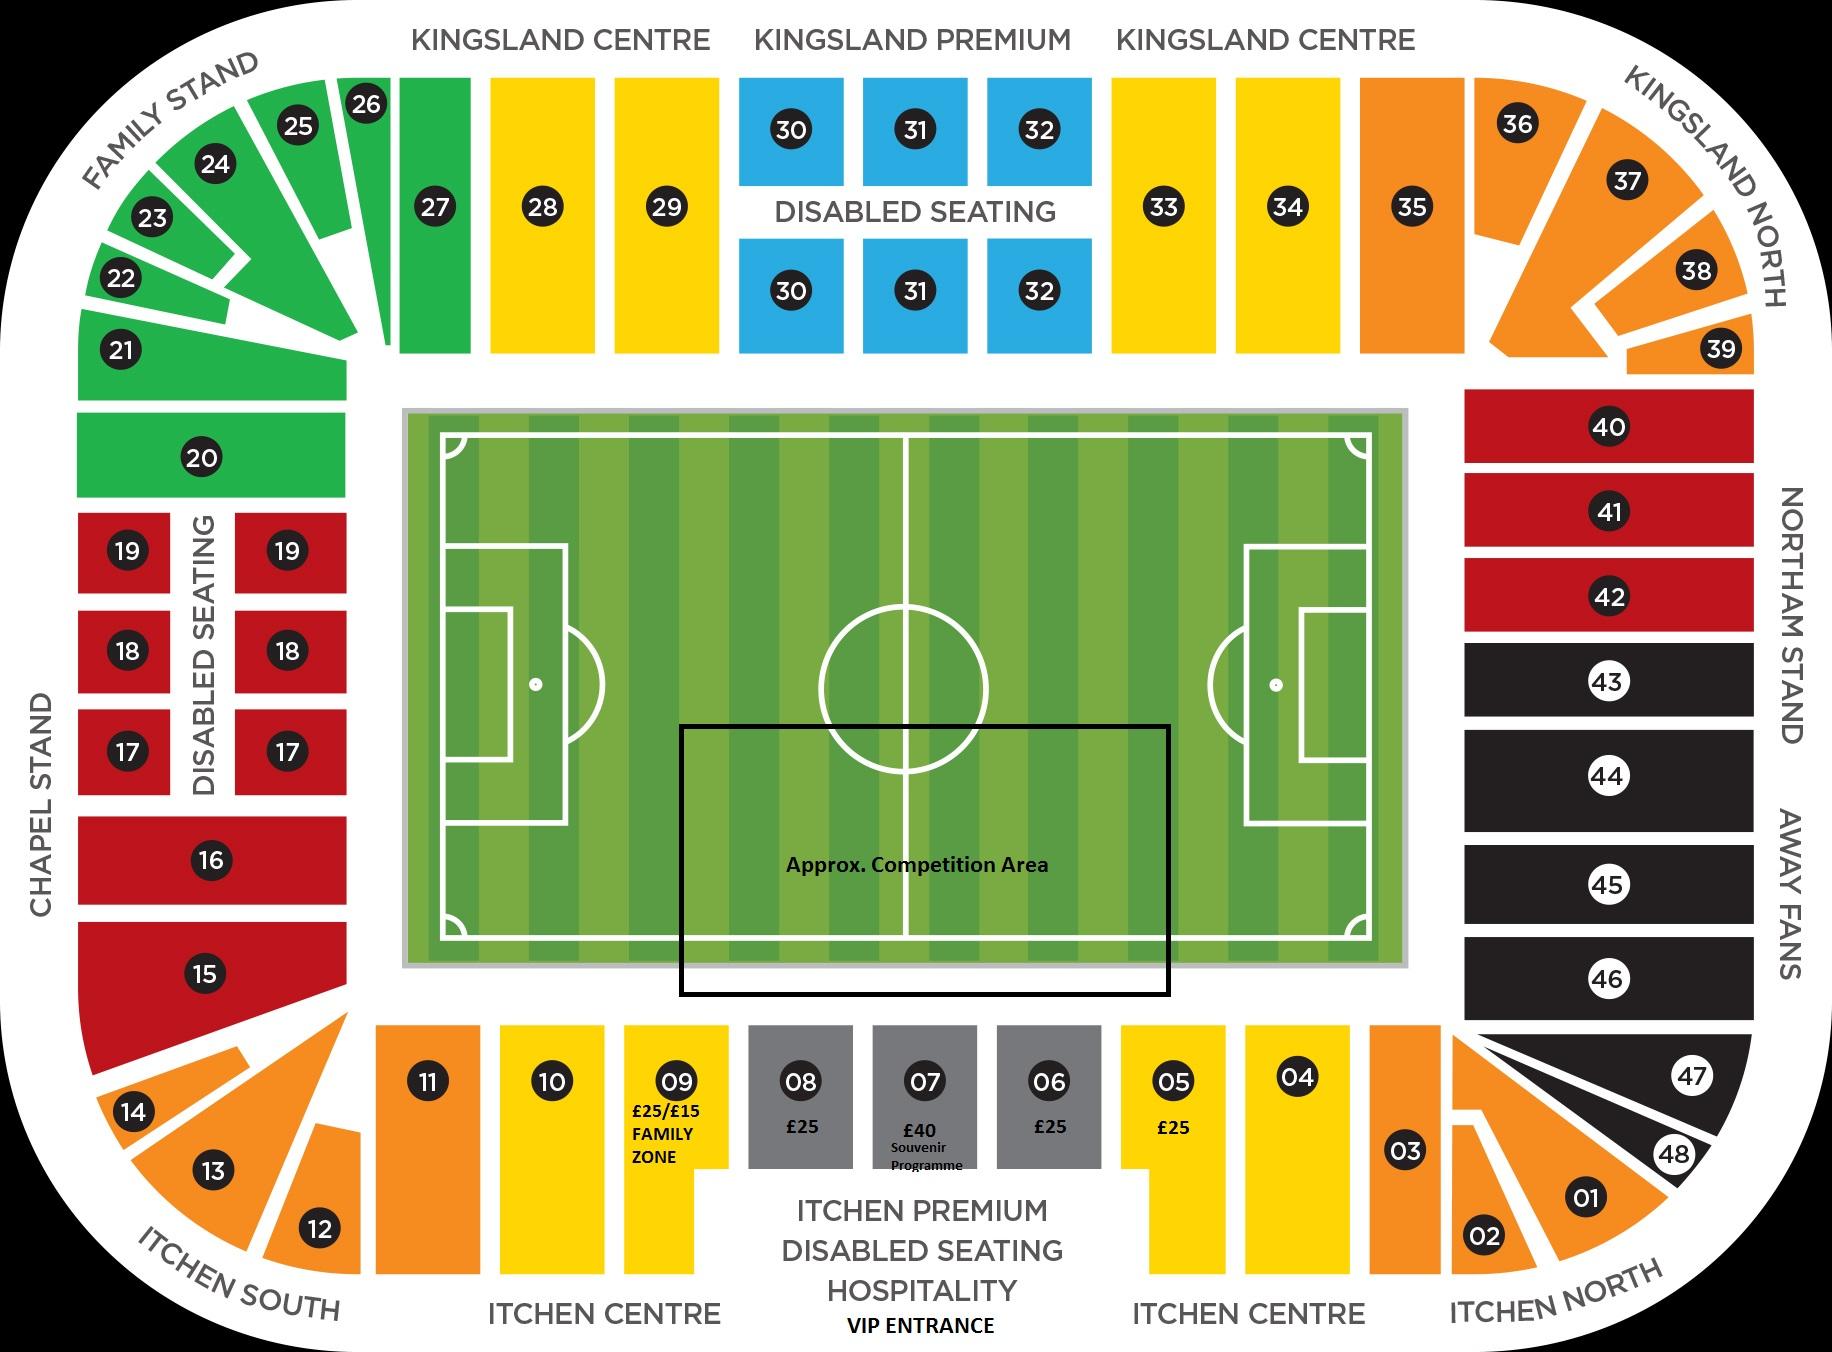 St Mary's Stadium Seating Block Plan